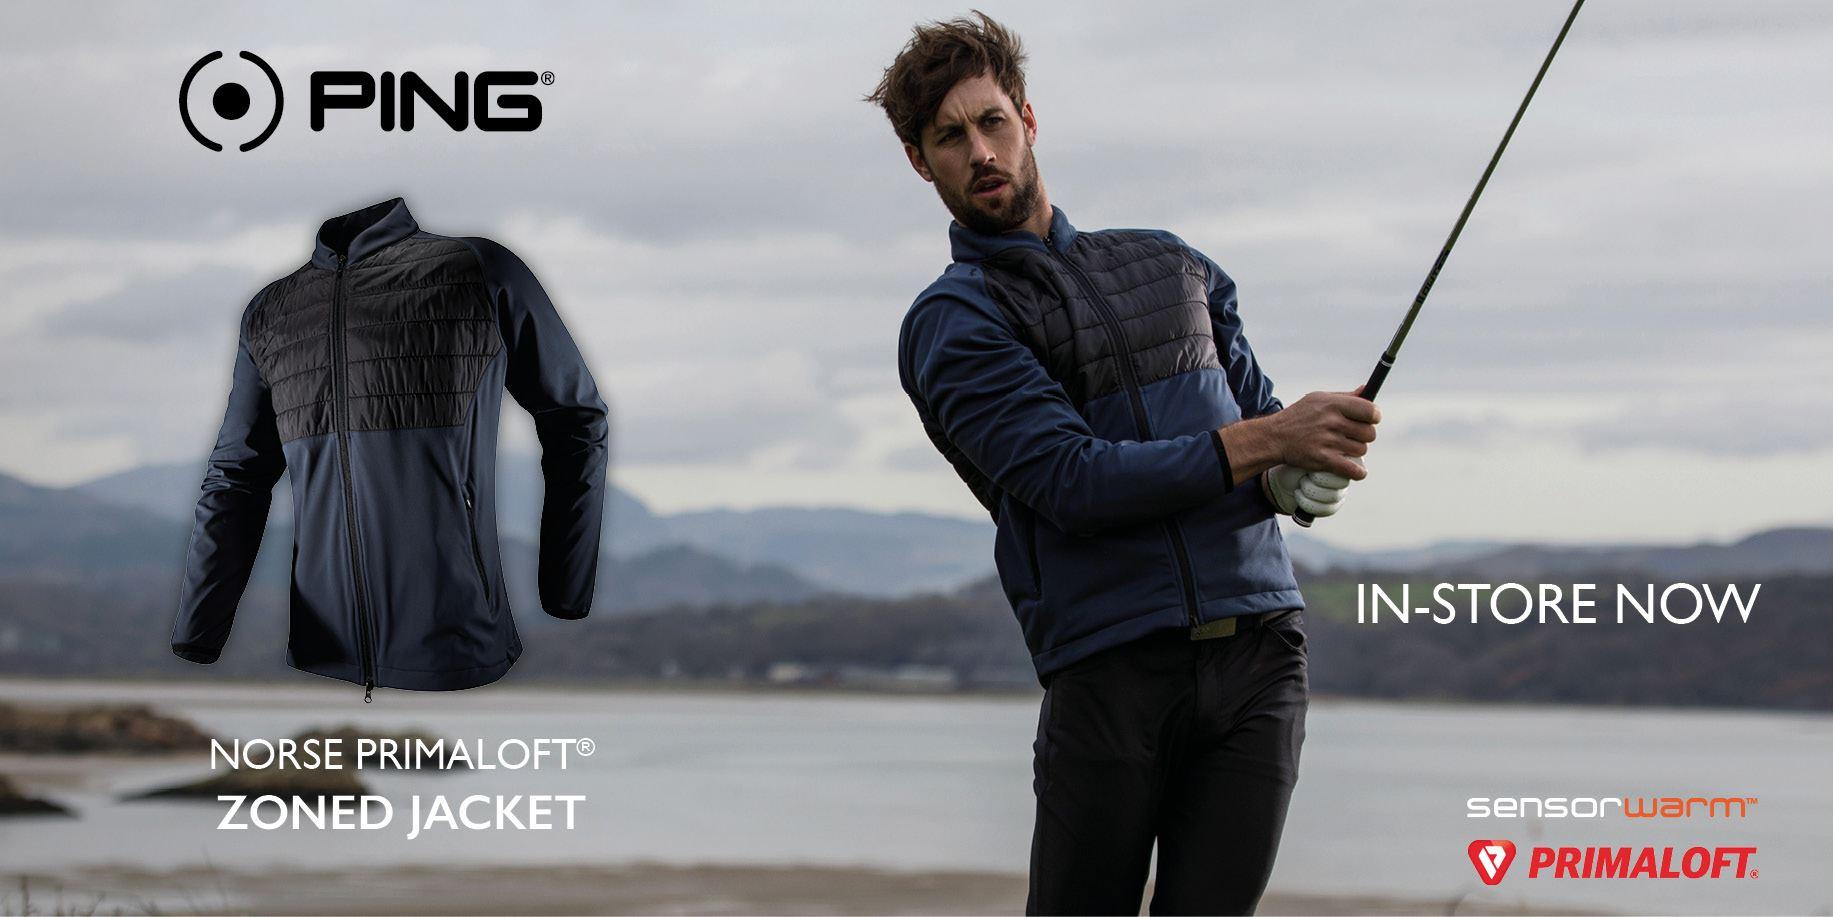 Ping Norse PrimaLoft Zoned Jacket